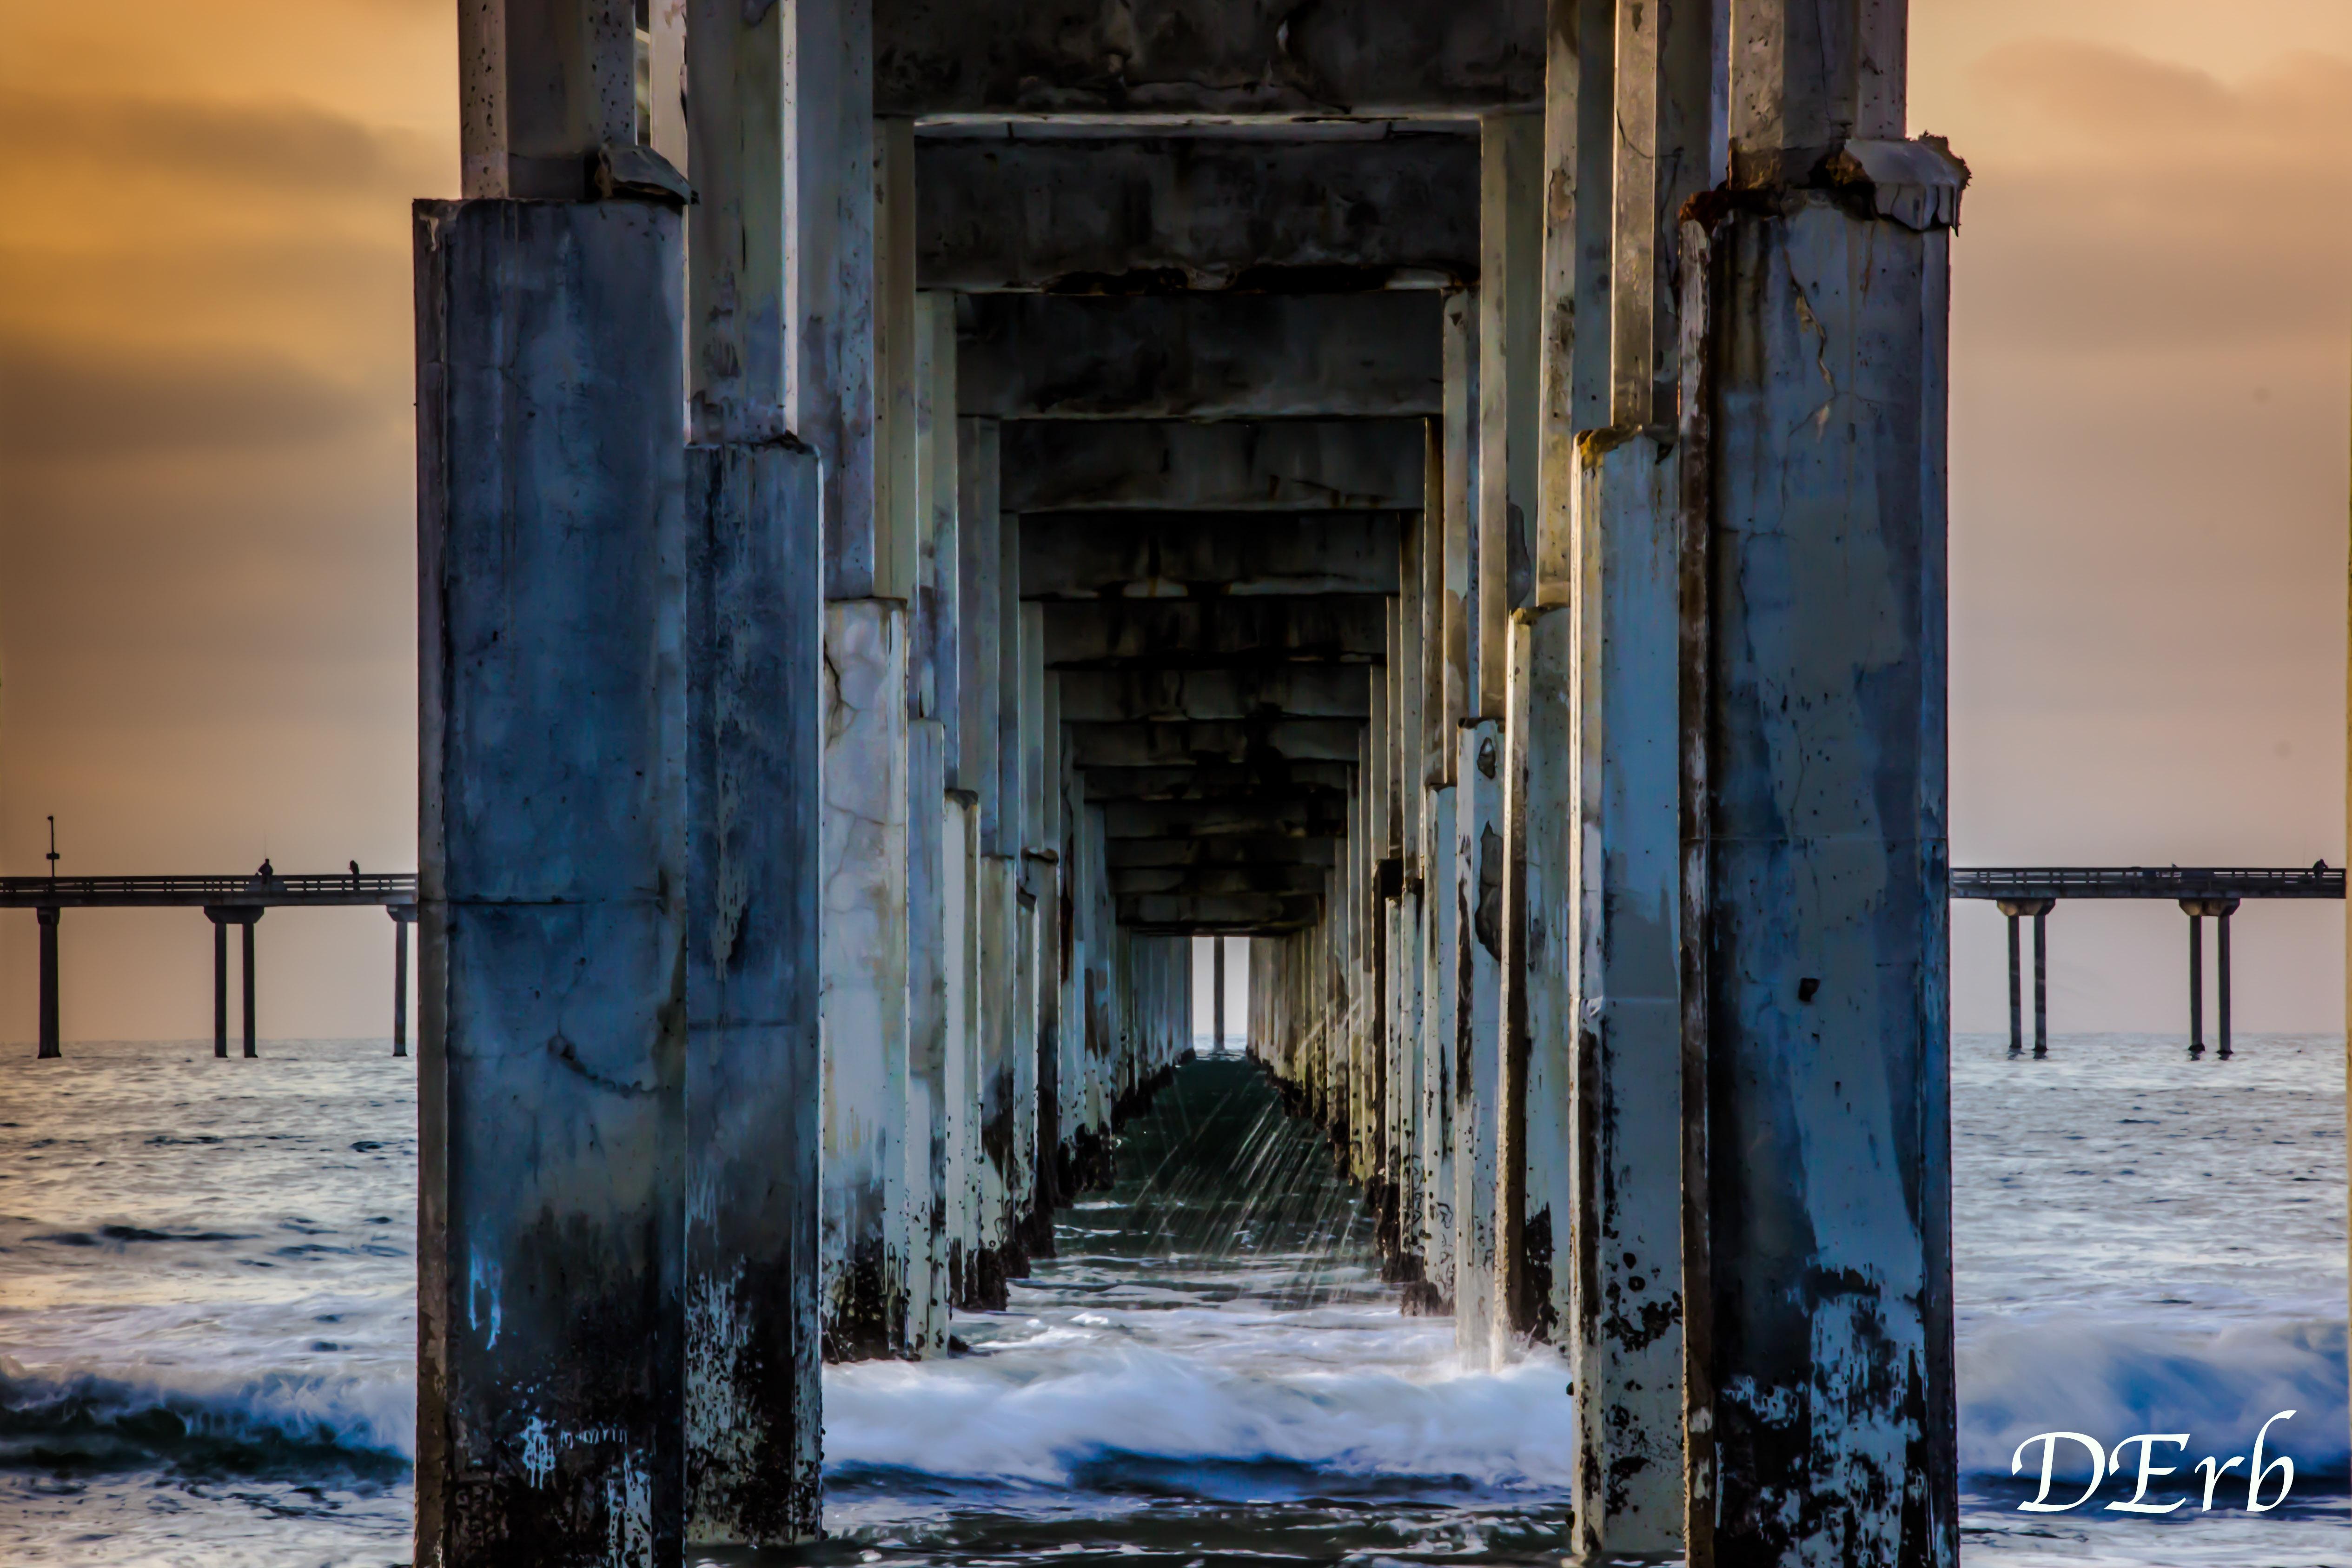 Southern California Pier